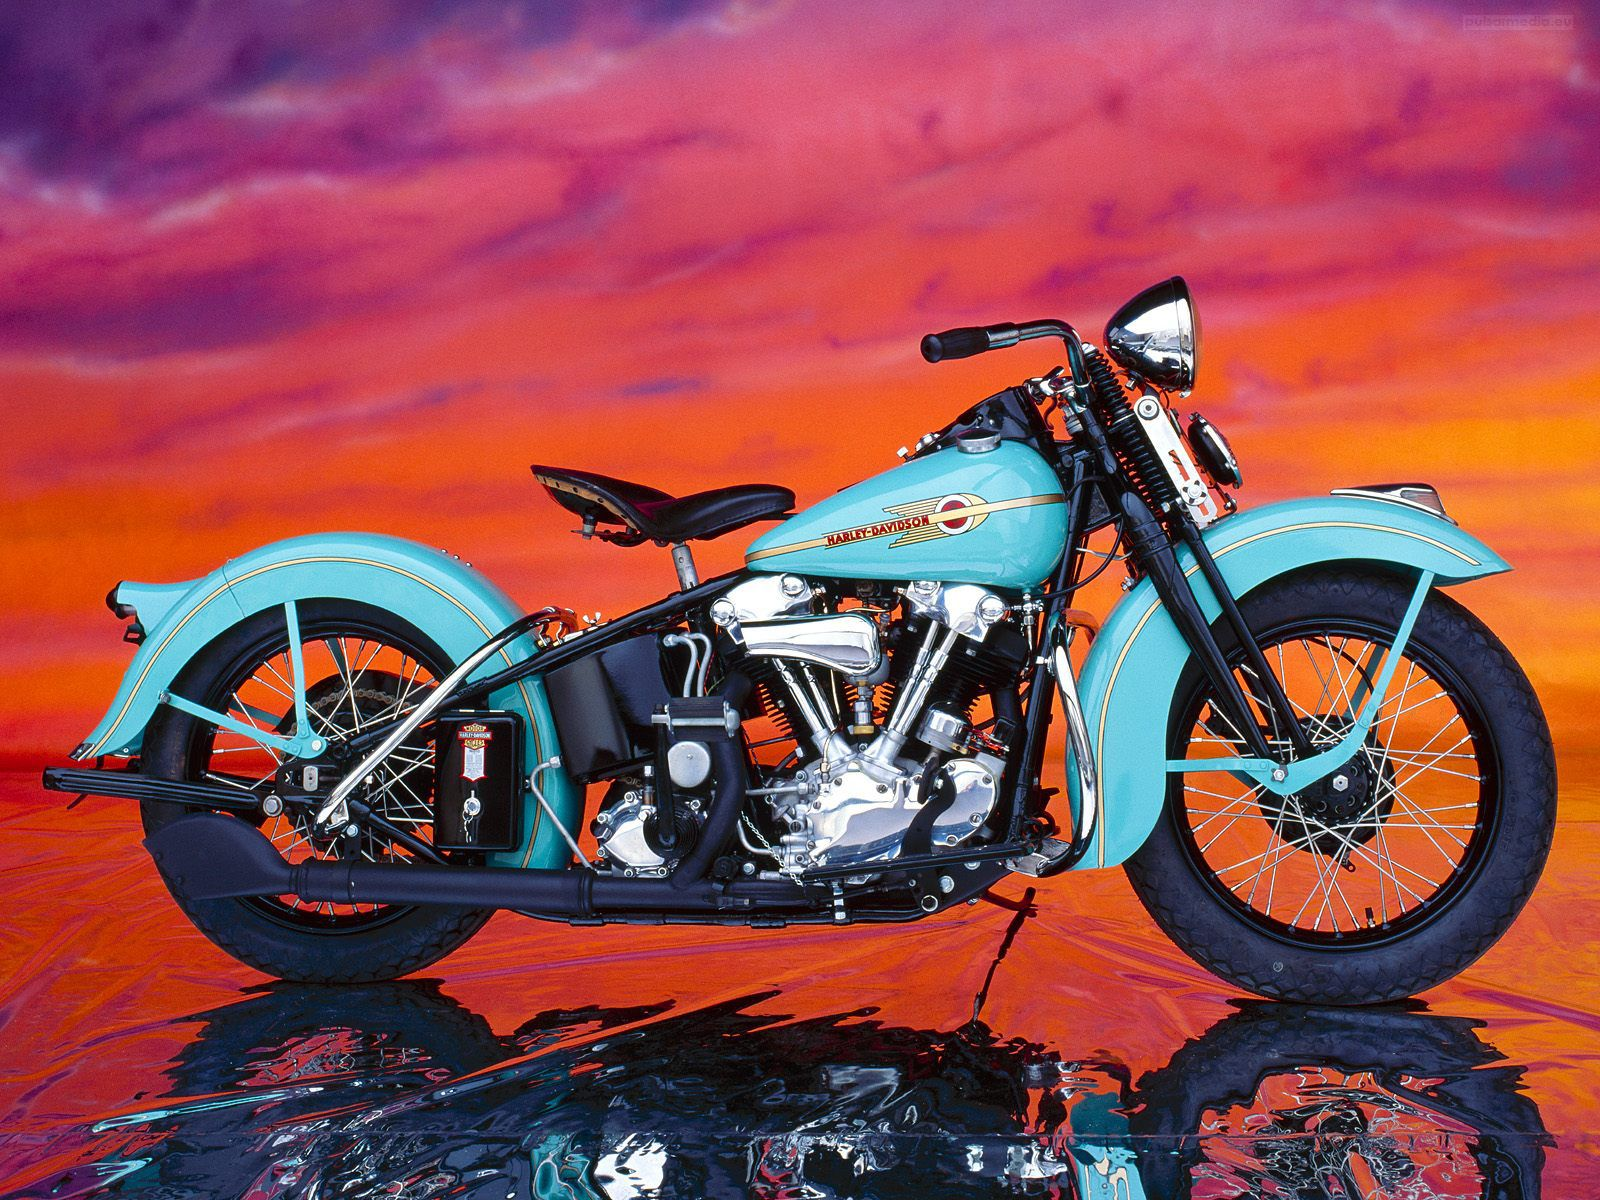 Top Wallpaper High Resolution Harley Davidson - b6b02933e80e6e429e2903c7844520c8  Trends_778185.jpg